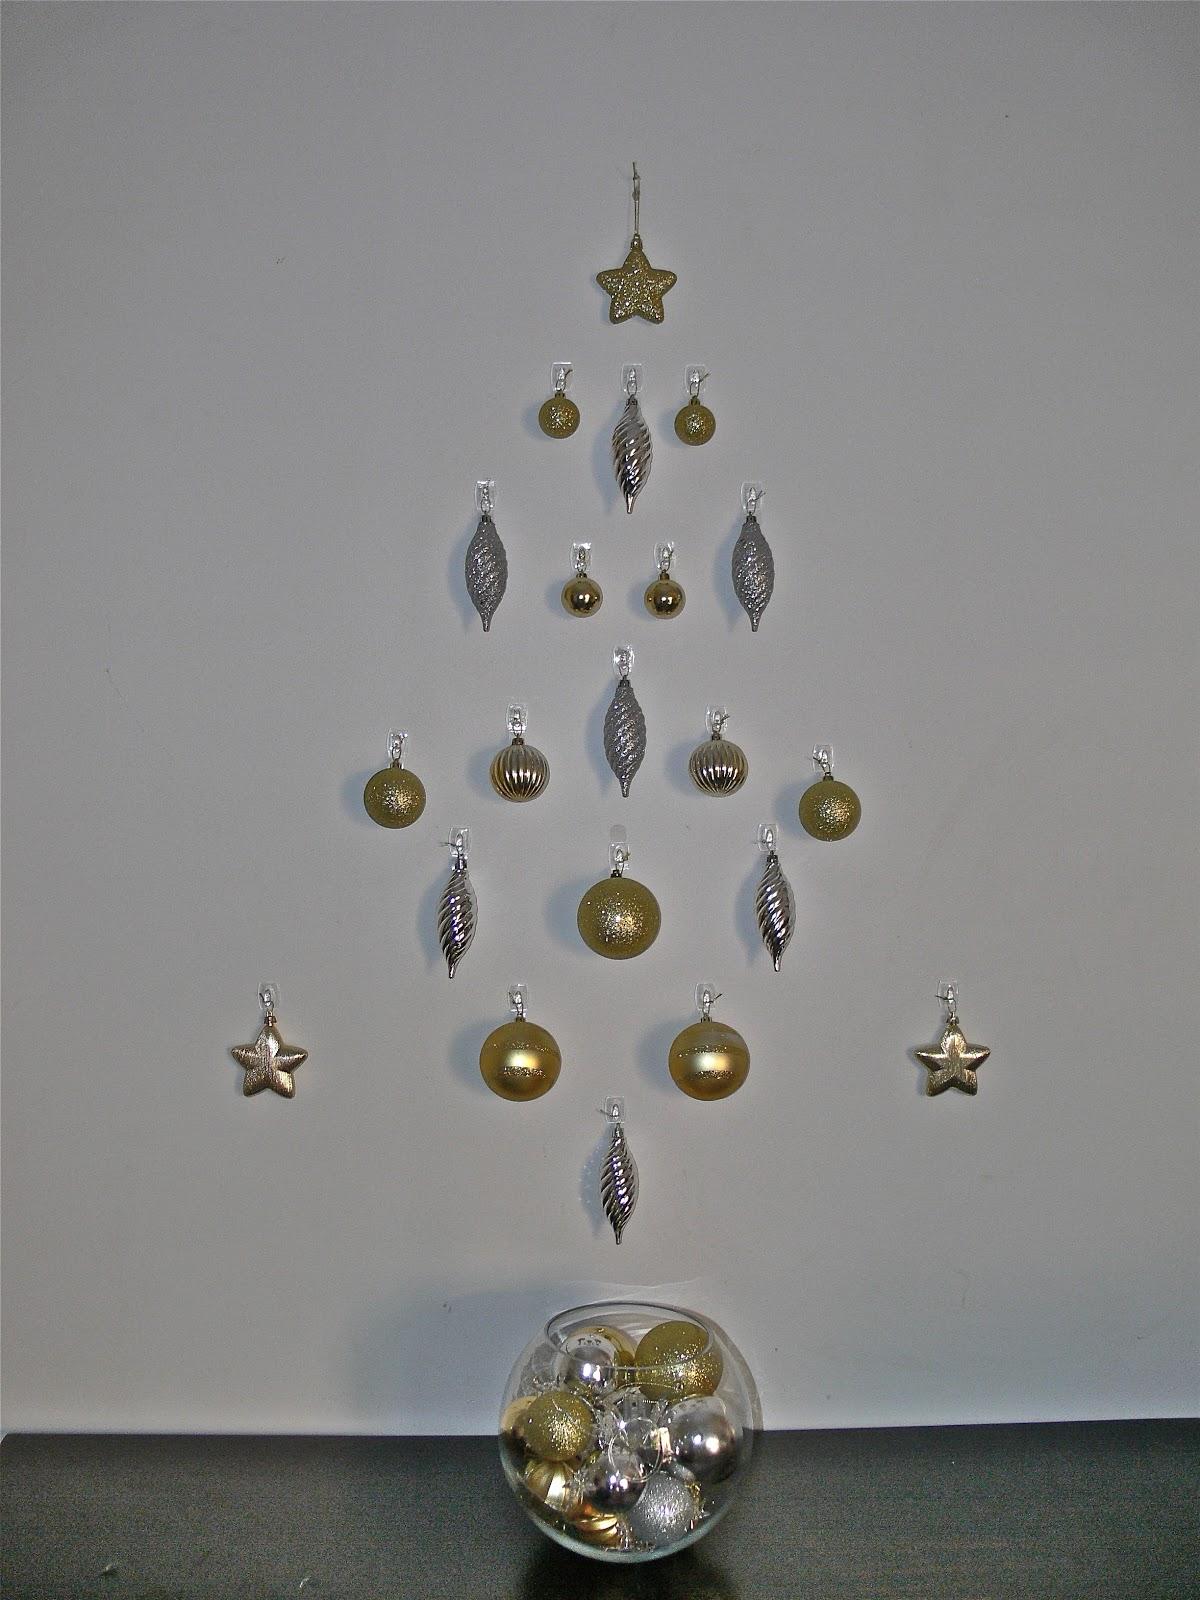 Laughs ideas inspiration christmas decorating ideas command hooks